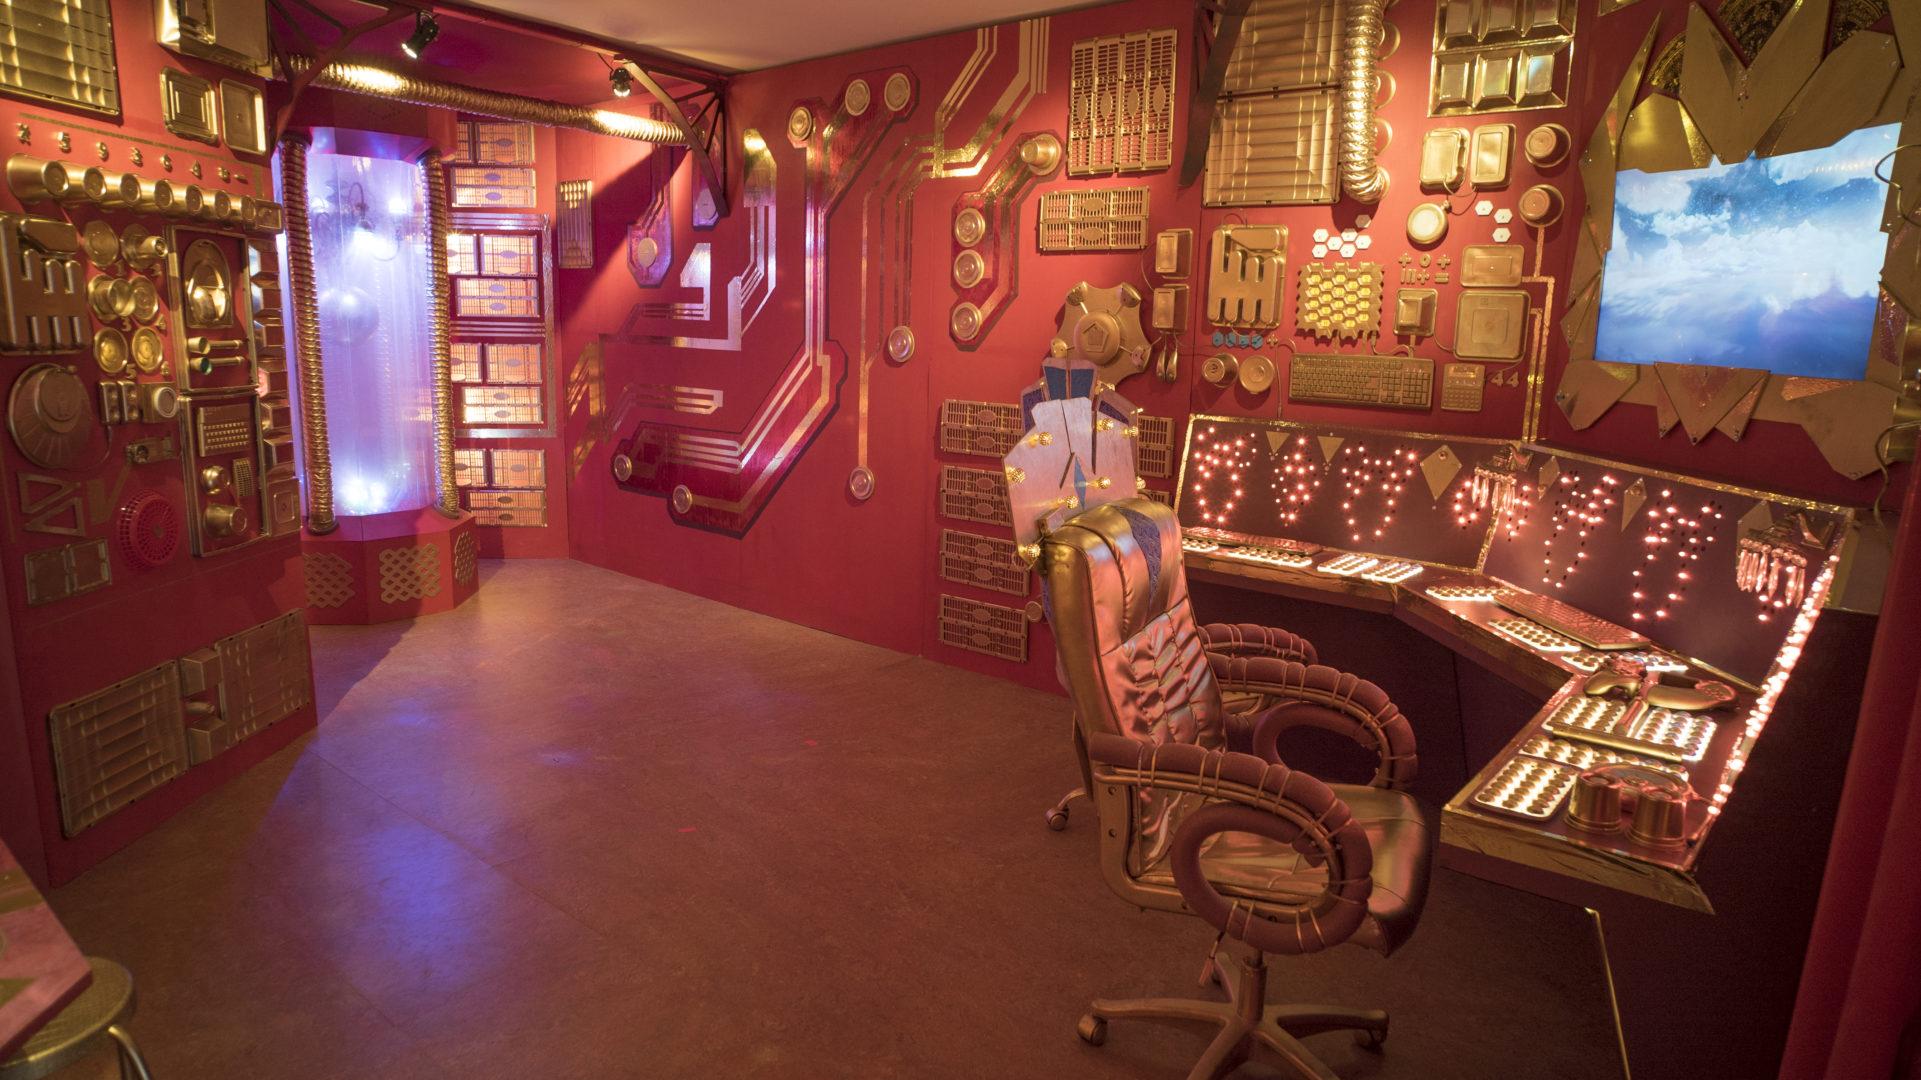 Epic Room Bollywood E Set Lighting 1 Bailes Light